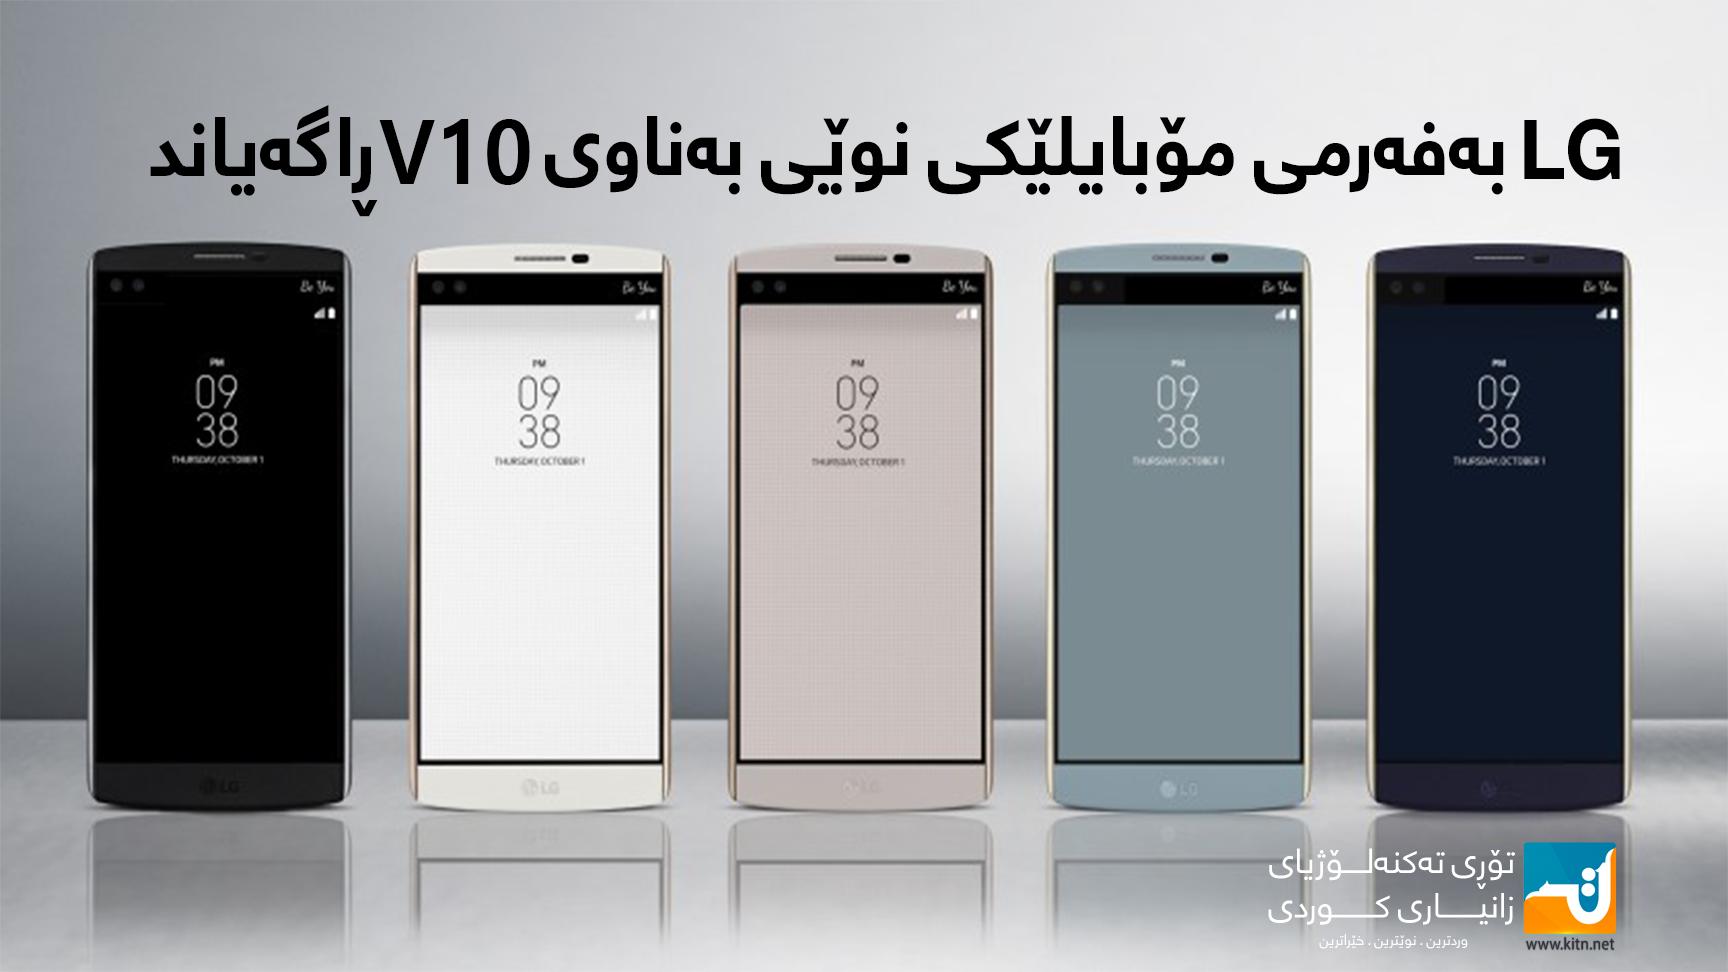 LG V10 POSTBOX